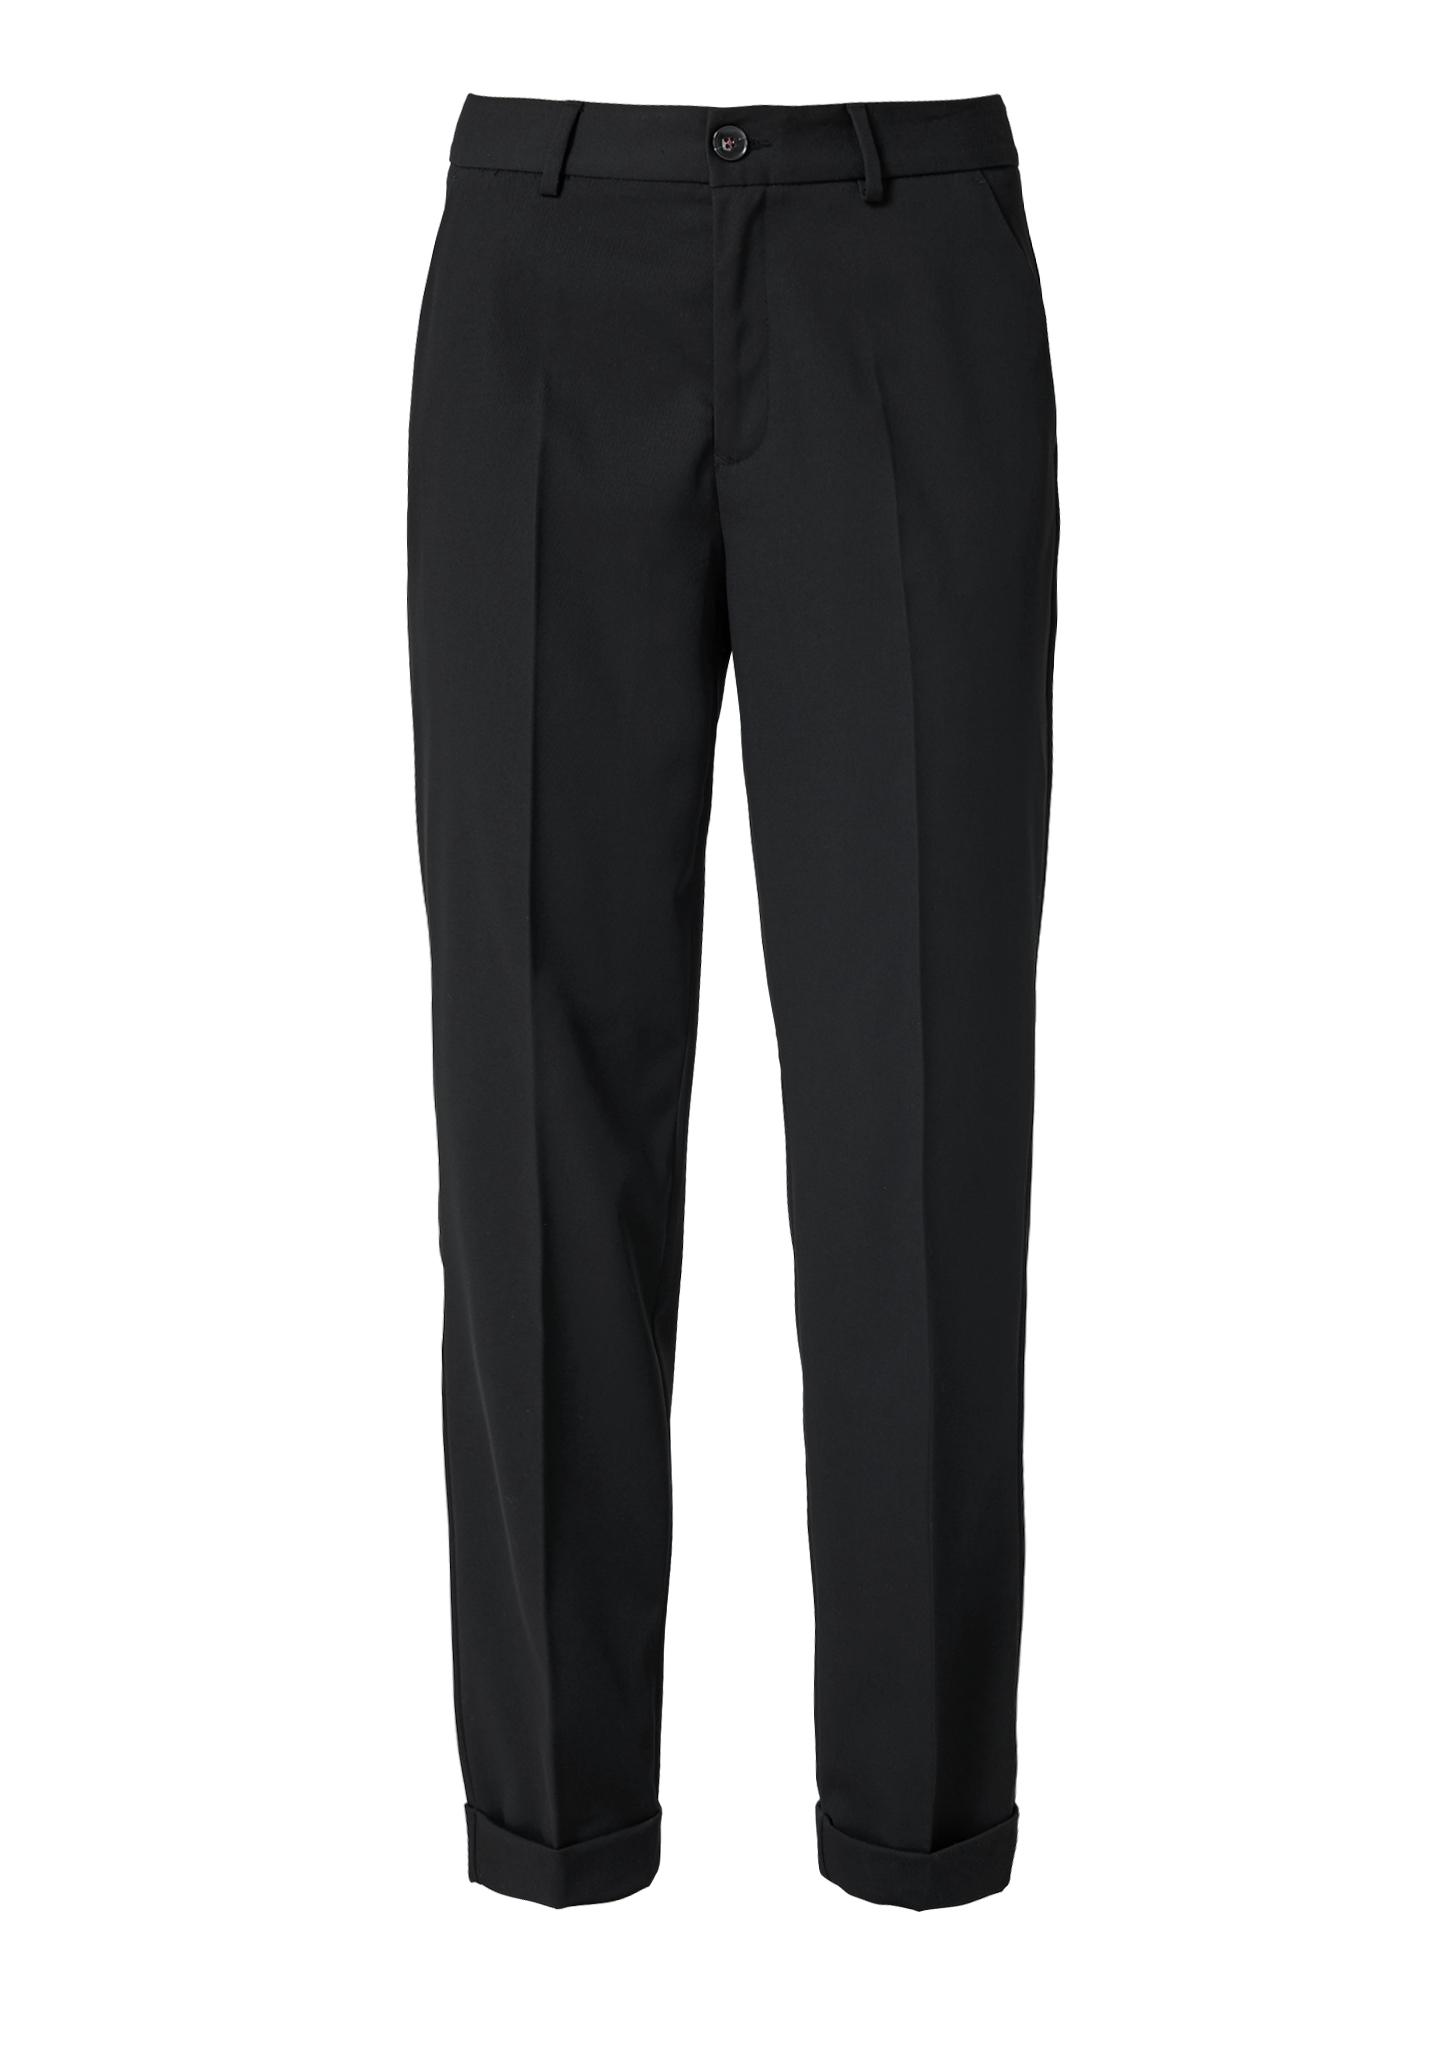 Bügelfaltenhose | Bekleidung > Hosen > Bügelfaltenhosen | s.Oliver